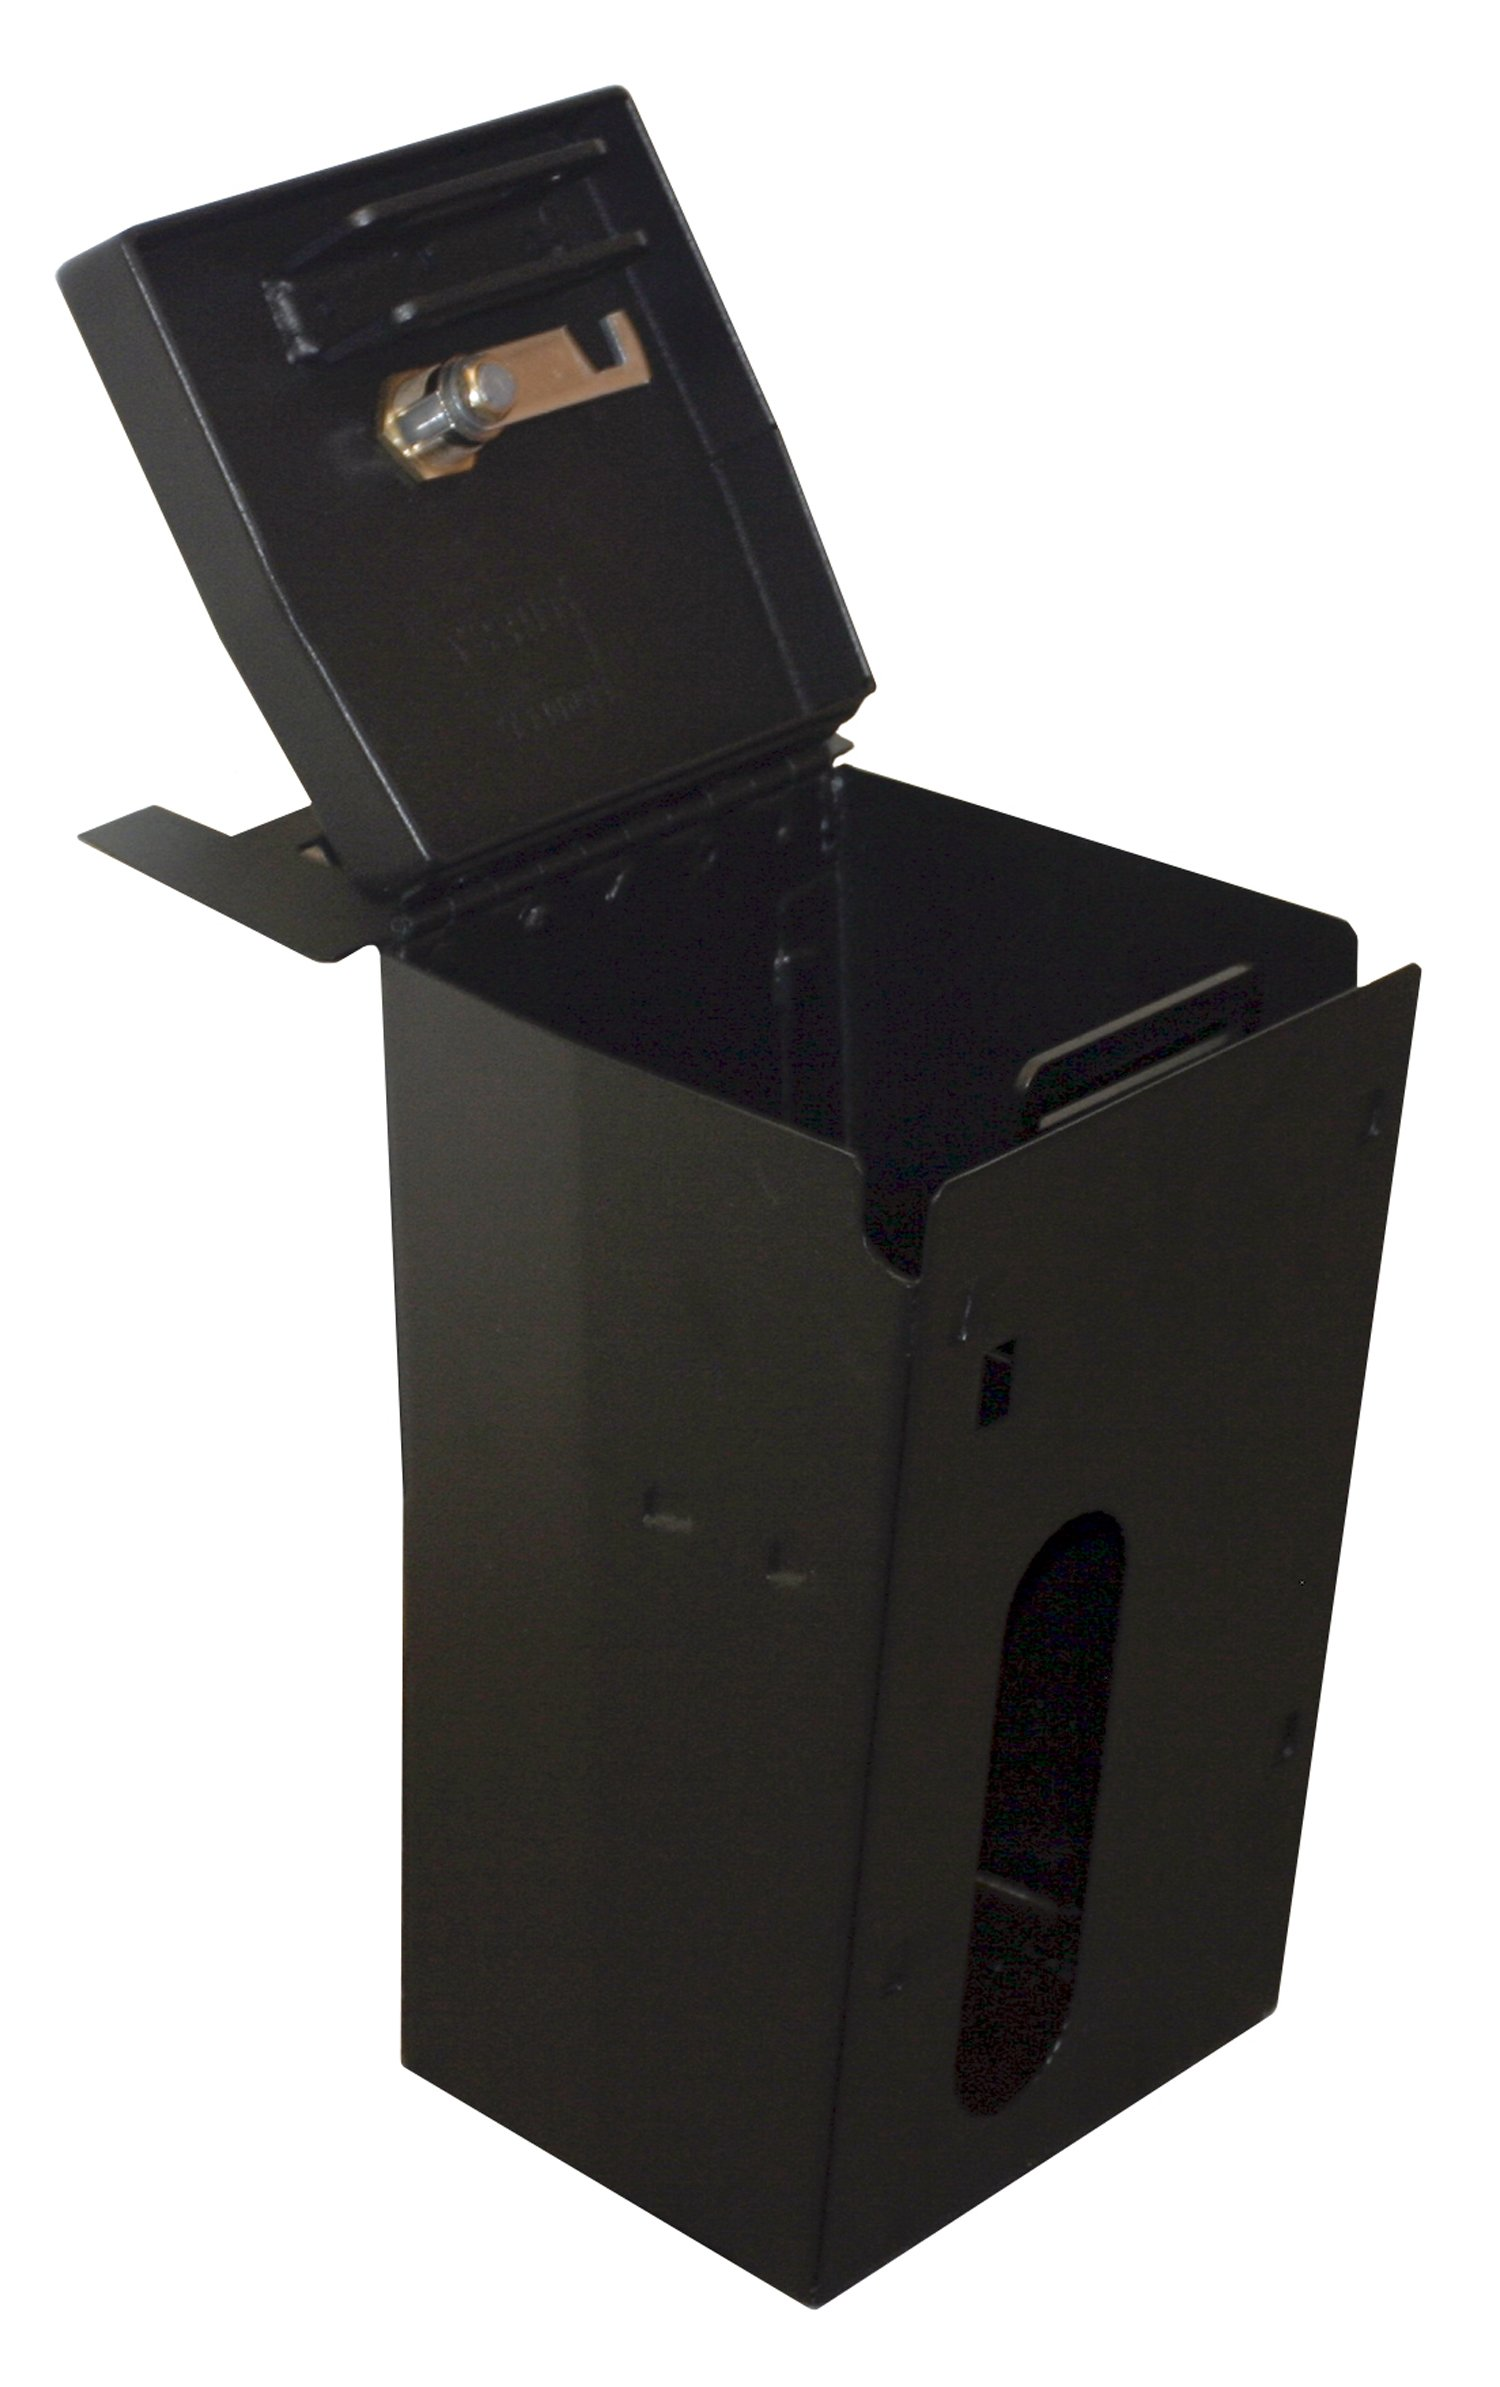 Tuffy 276-01 Budget Insert, Mounts Inside OEM Console for 2011+ Jk Wrangler by Tuffy (Image #2)